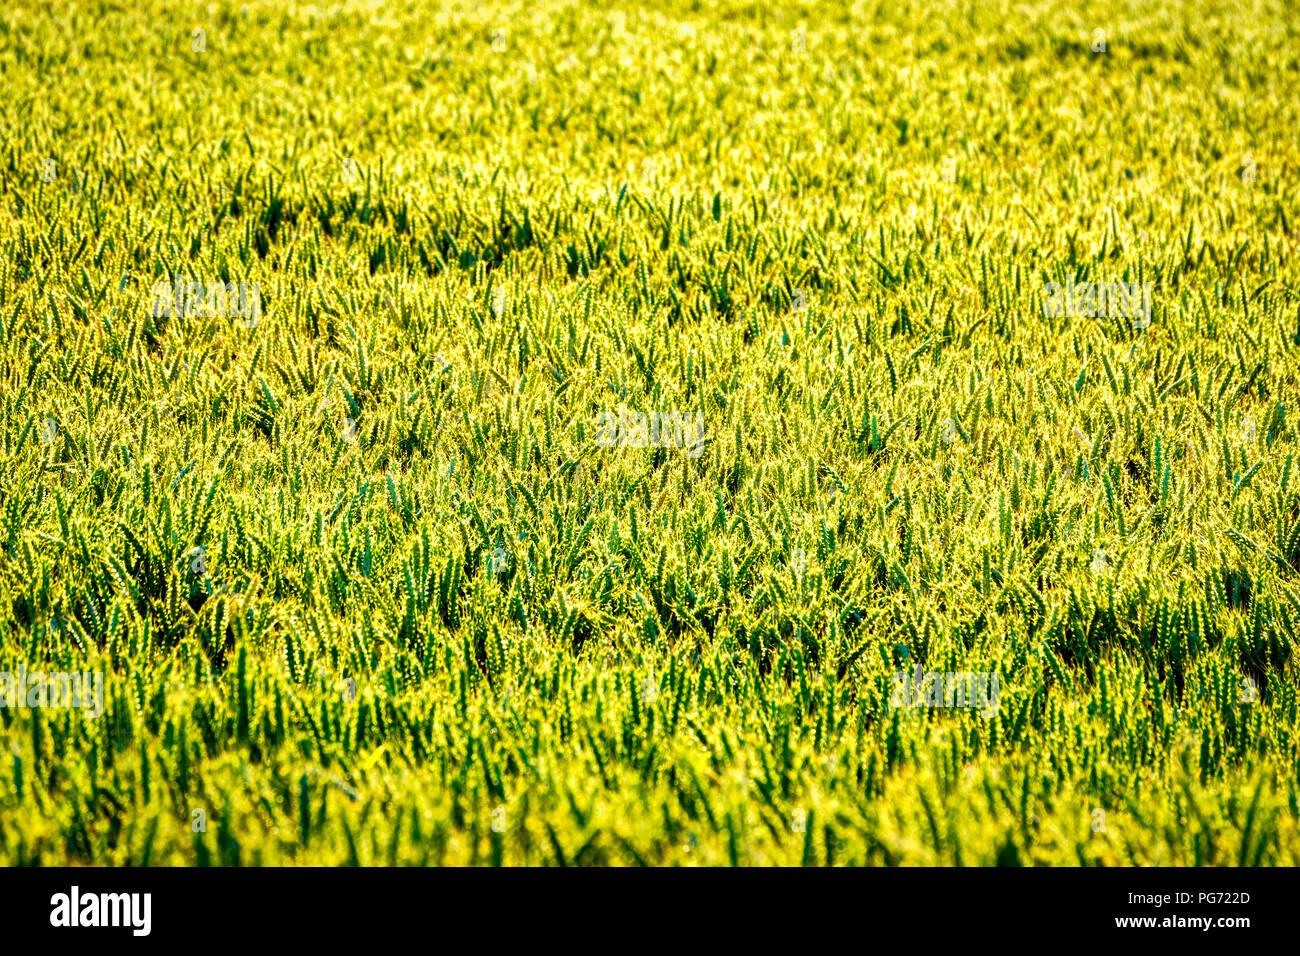 UK, Scotland, East Lothian, field of Wheat (Triticum) - Stock Image